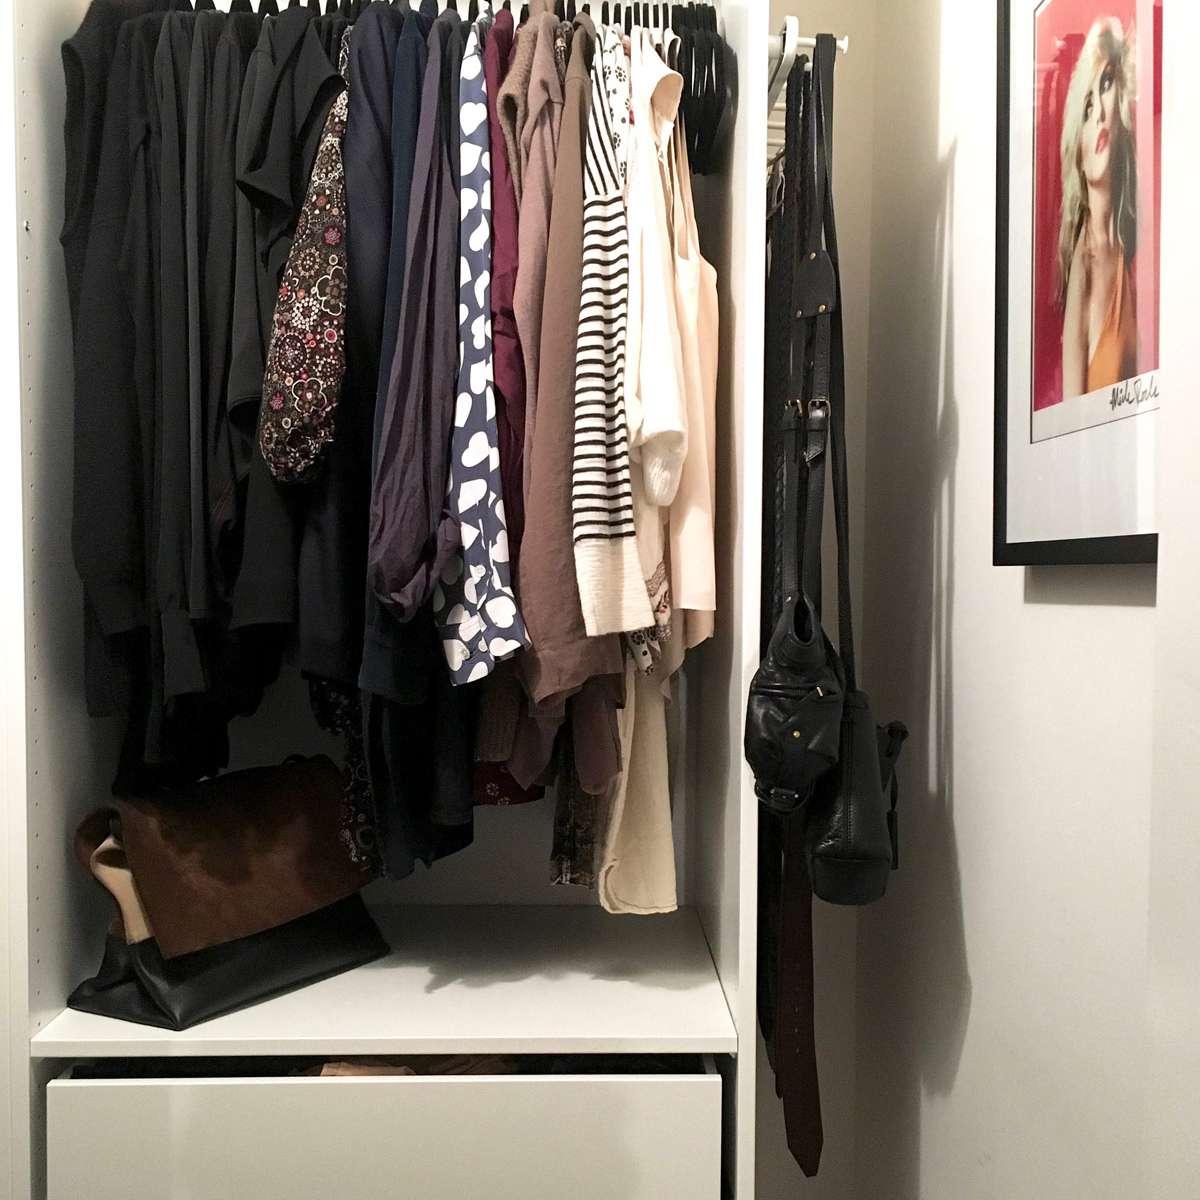 Closet with organization system